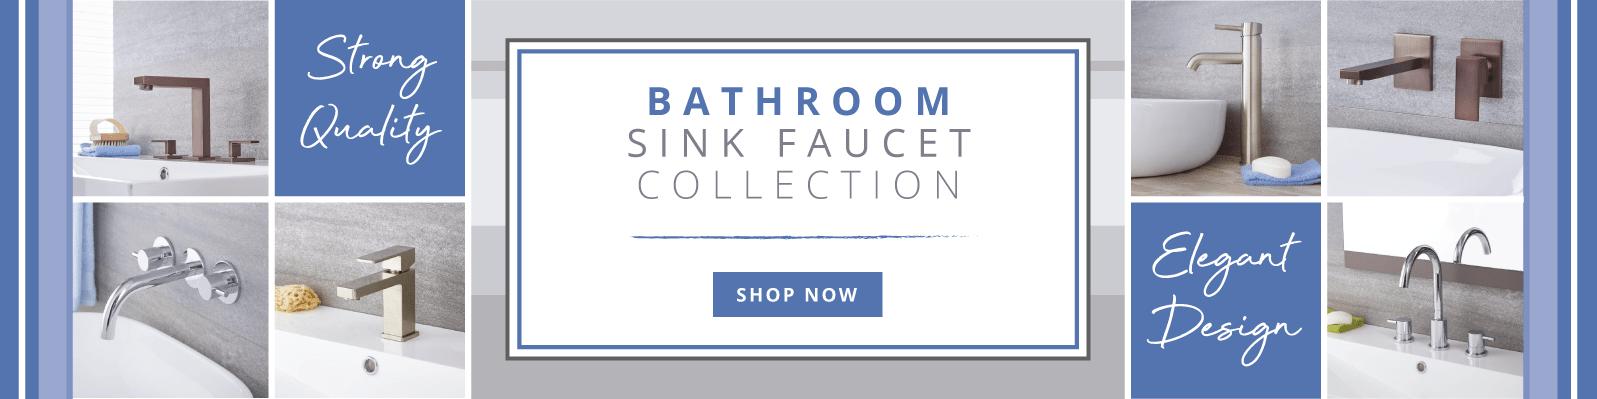 Bathroom Sink Faucet Collection Elegant Design, Uncompromising Quality